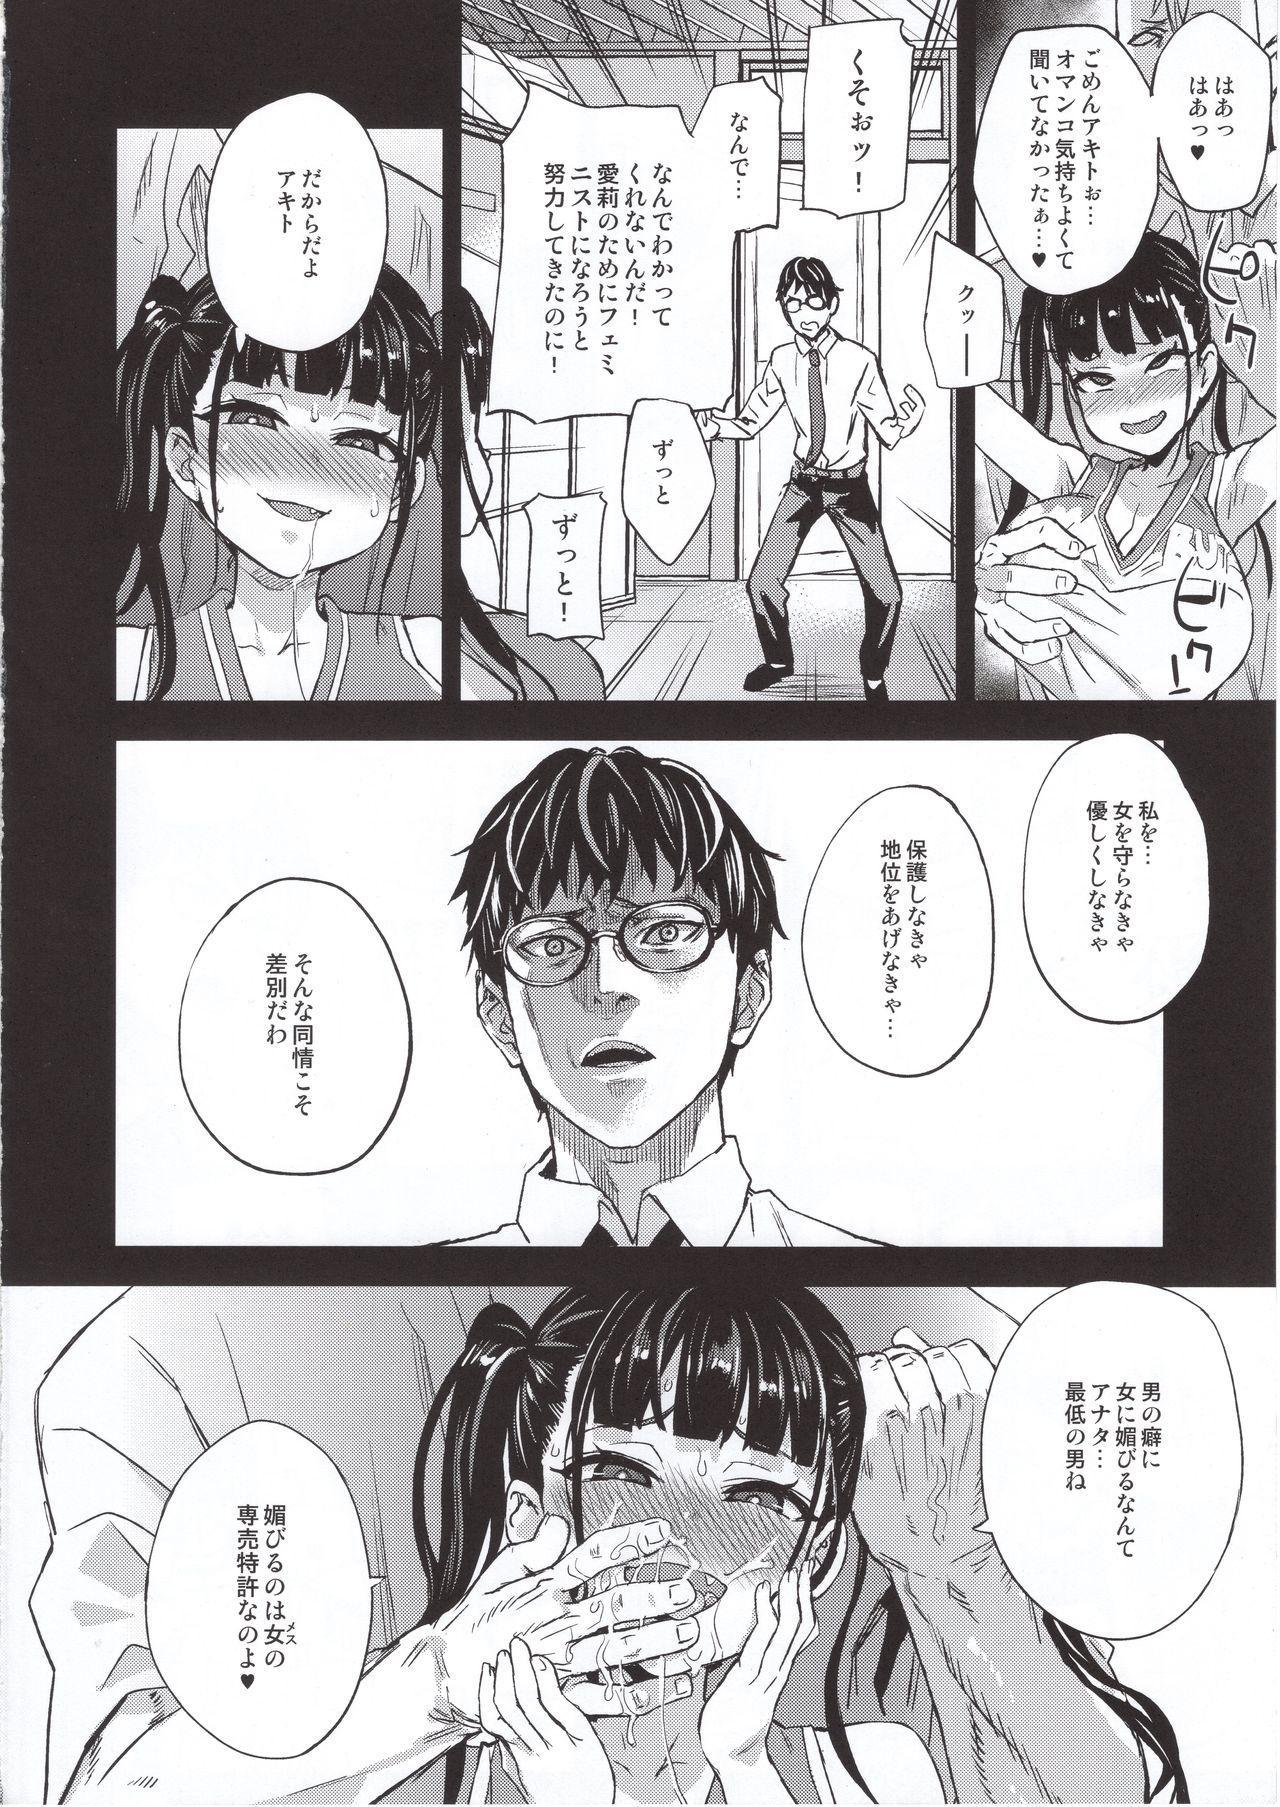 VictimGirlsR Watashi wa, Makemasen! 38